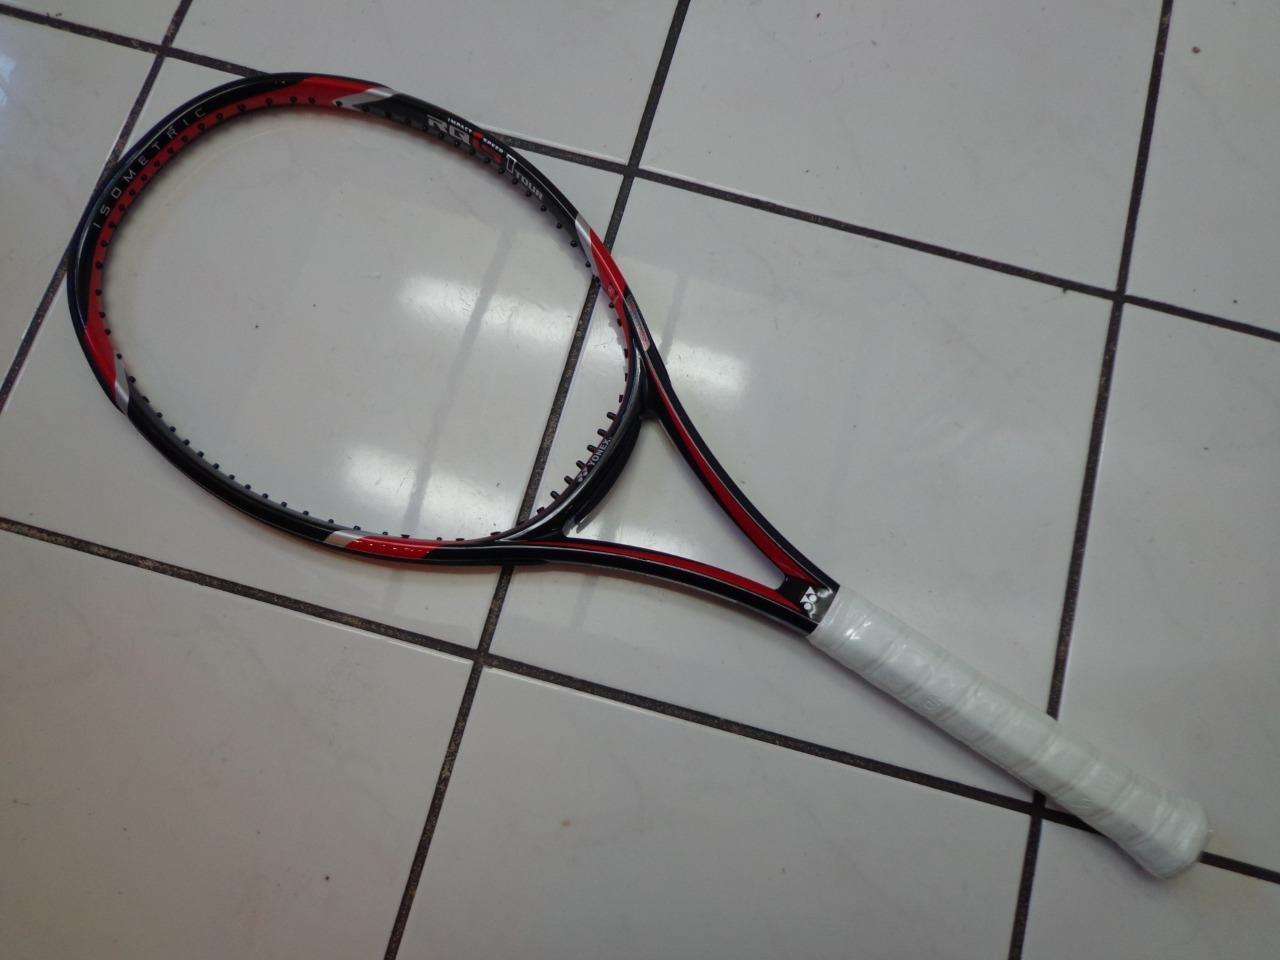 Nuevo Yonex Rq es 1 Tour 95 Head 4 1 4 Grip Tenis Raqueta